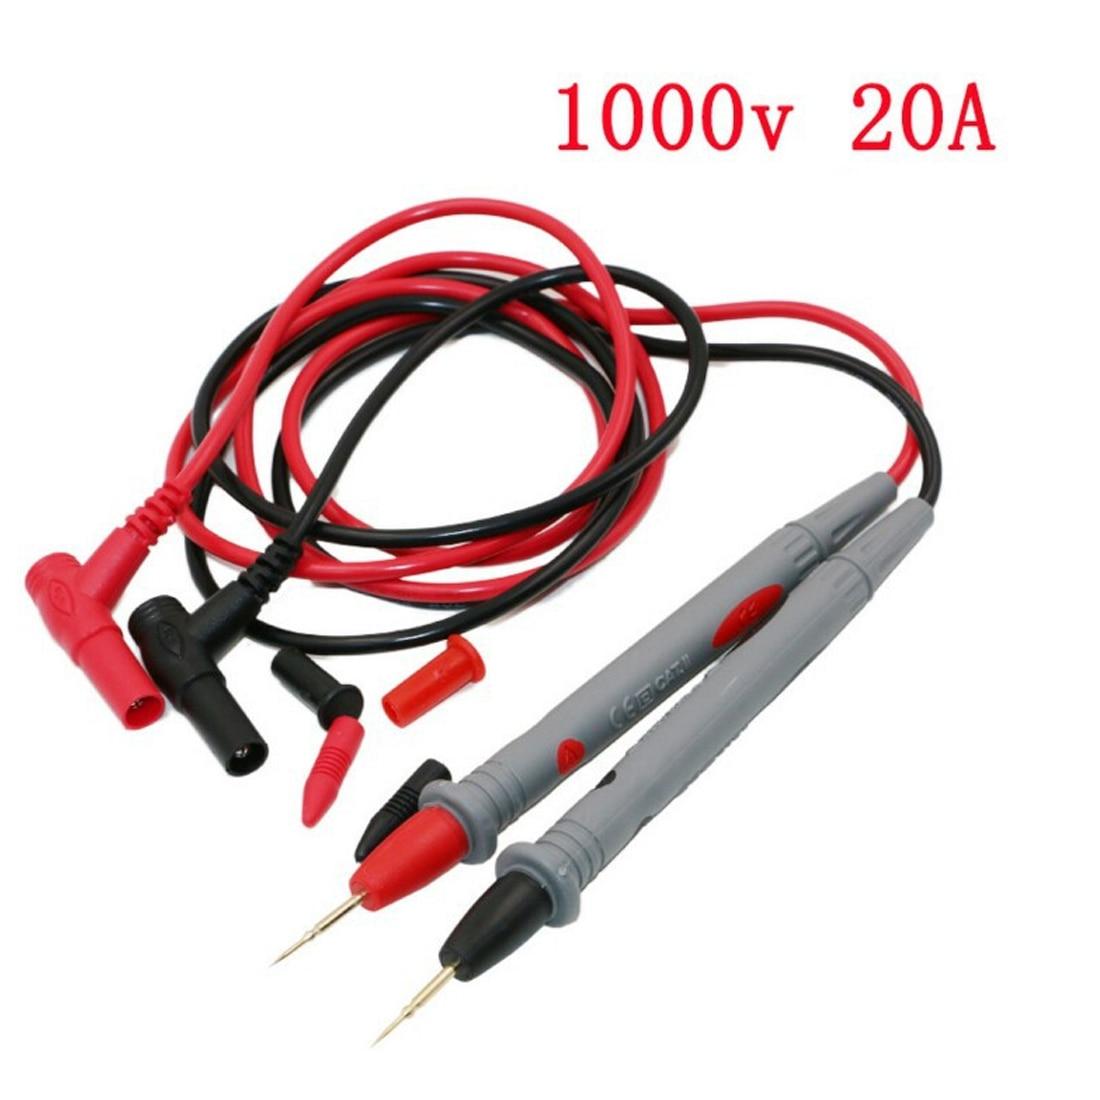 2 Pcs 1000V Electrical Voltmeter Meter Lead Wire Testing Hook 15cm Length